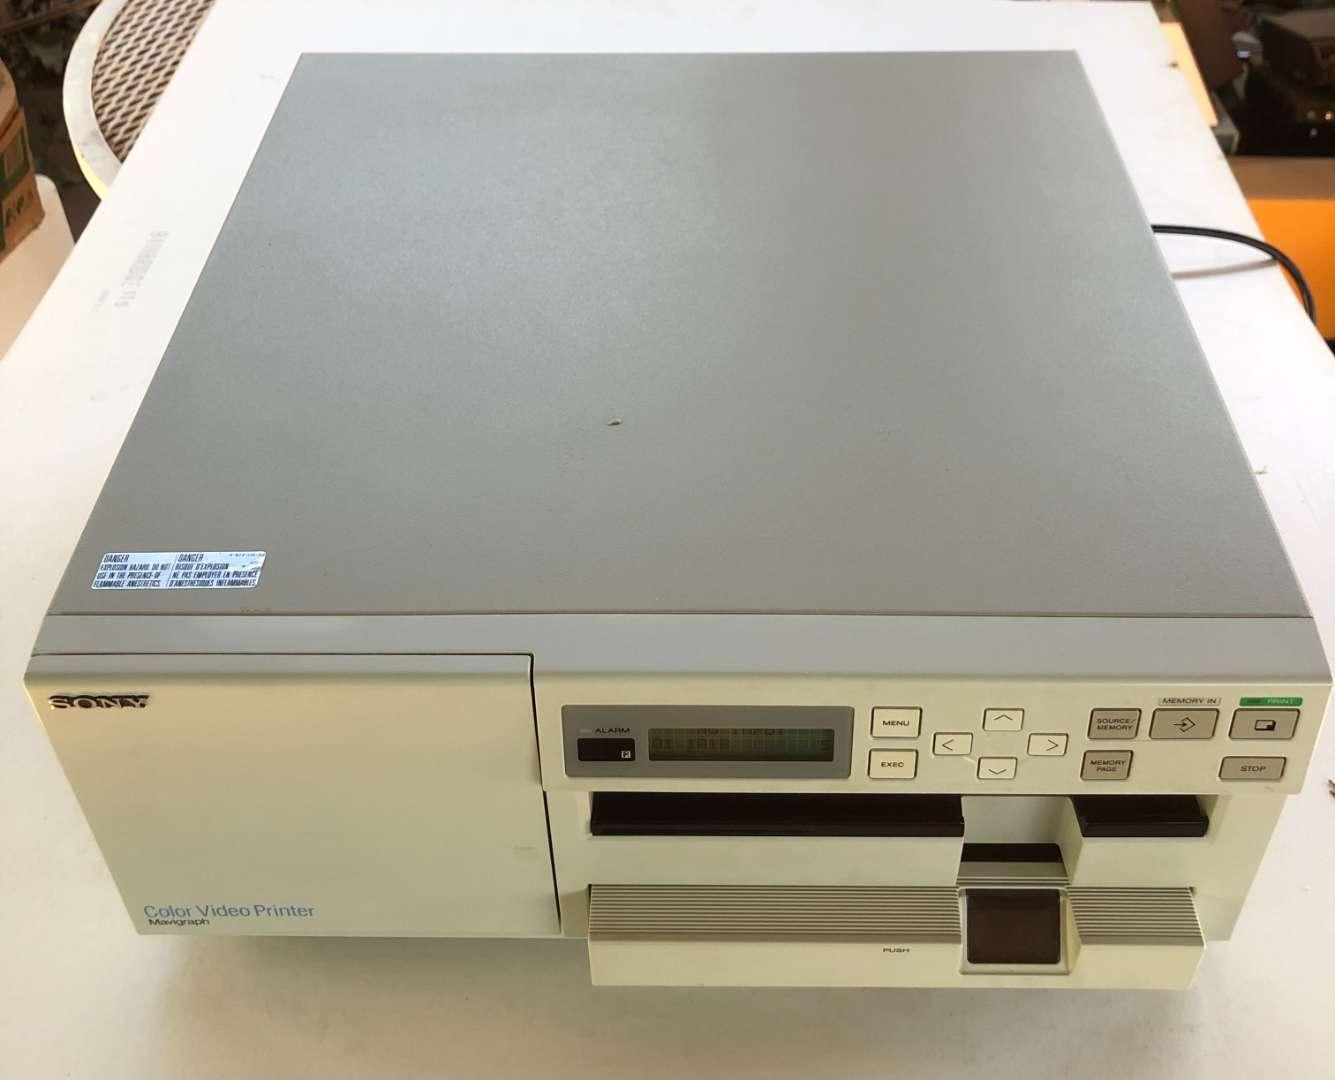 Lot # 160 - 2 Sony Video Printers UP5200 (main image)